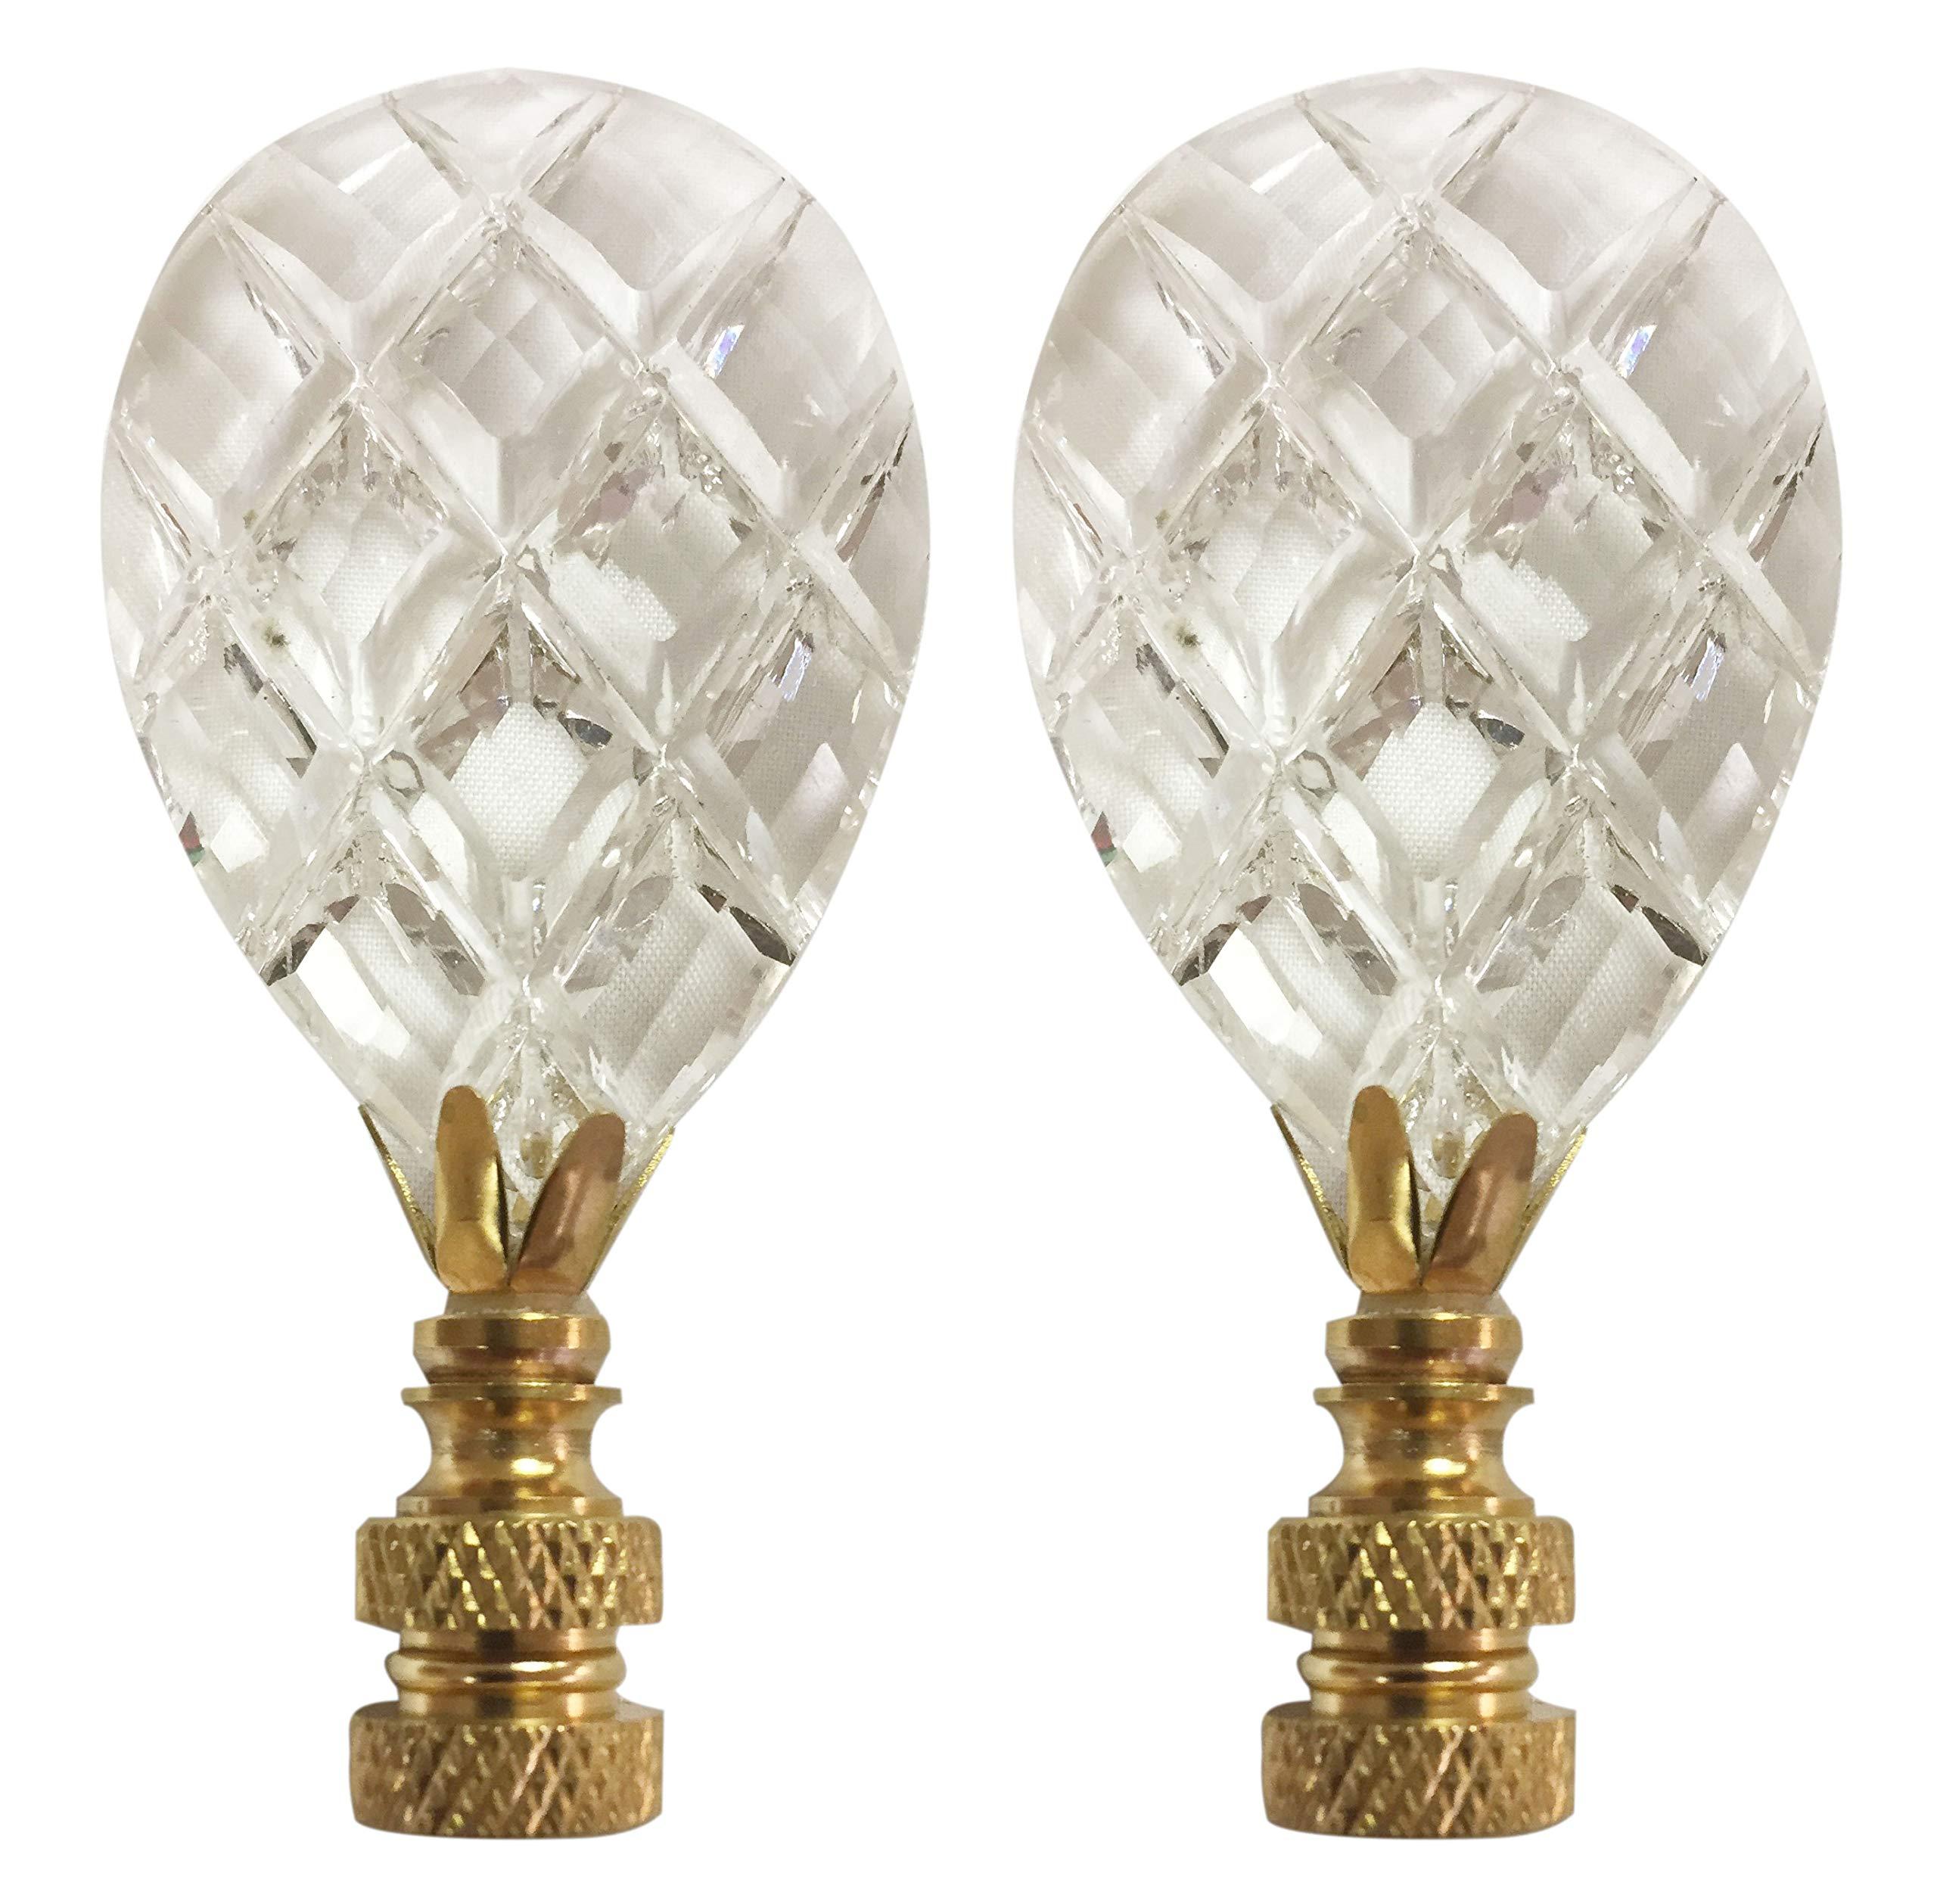 Royal Designs CCF2013M-PB-2 Medium Diamond Swiss Cut Lamp Finial, Clear Crystal Prism with Polished Brass Base, Set of 2